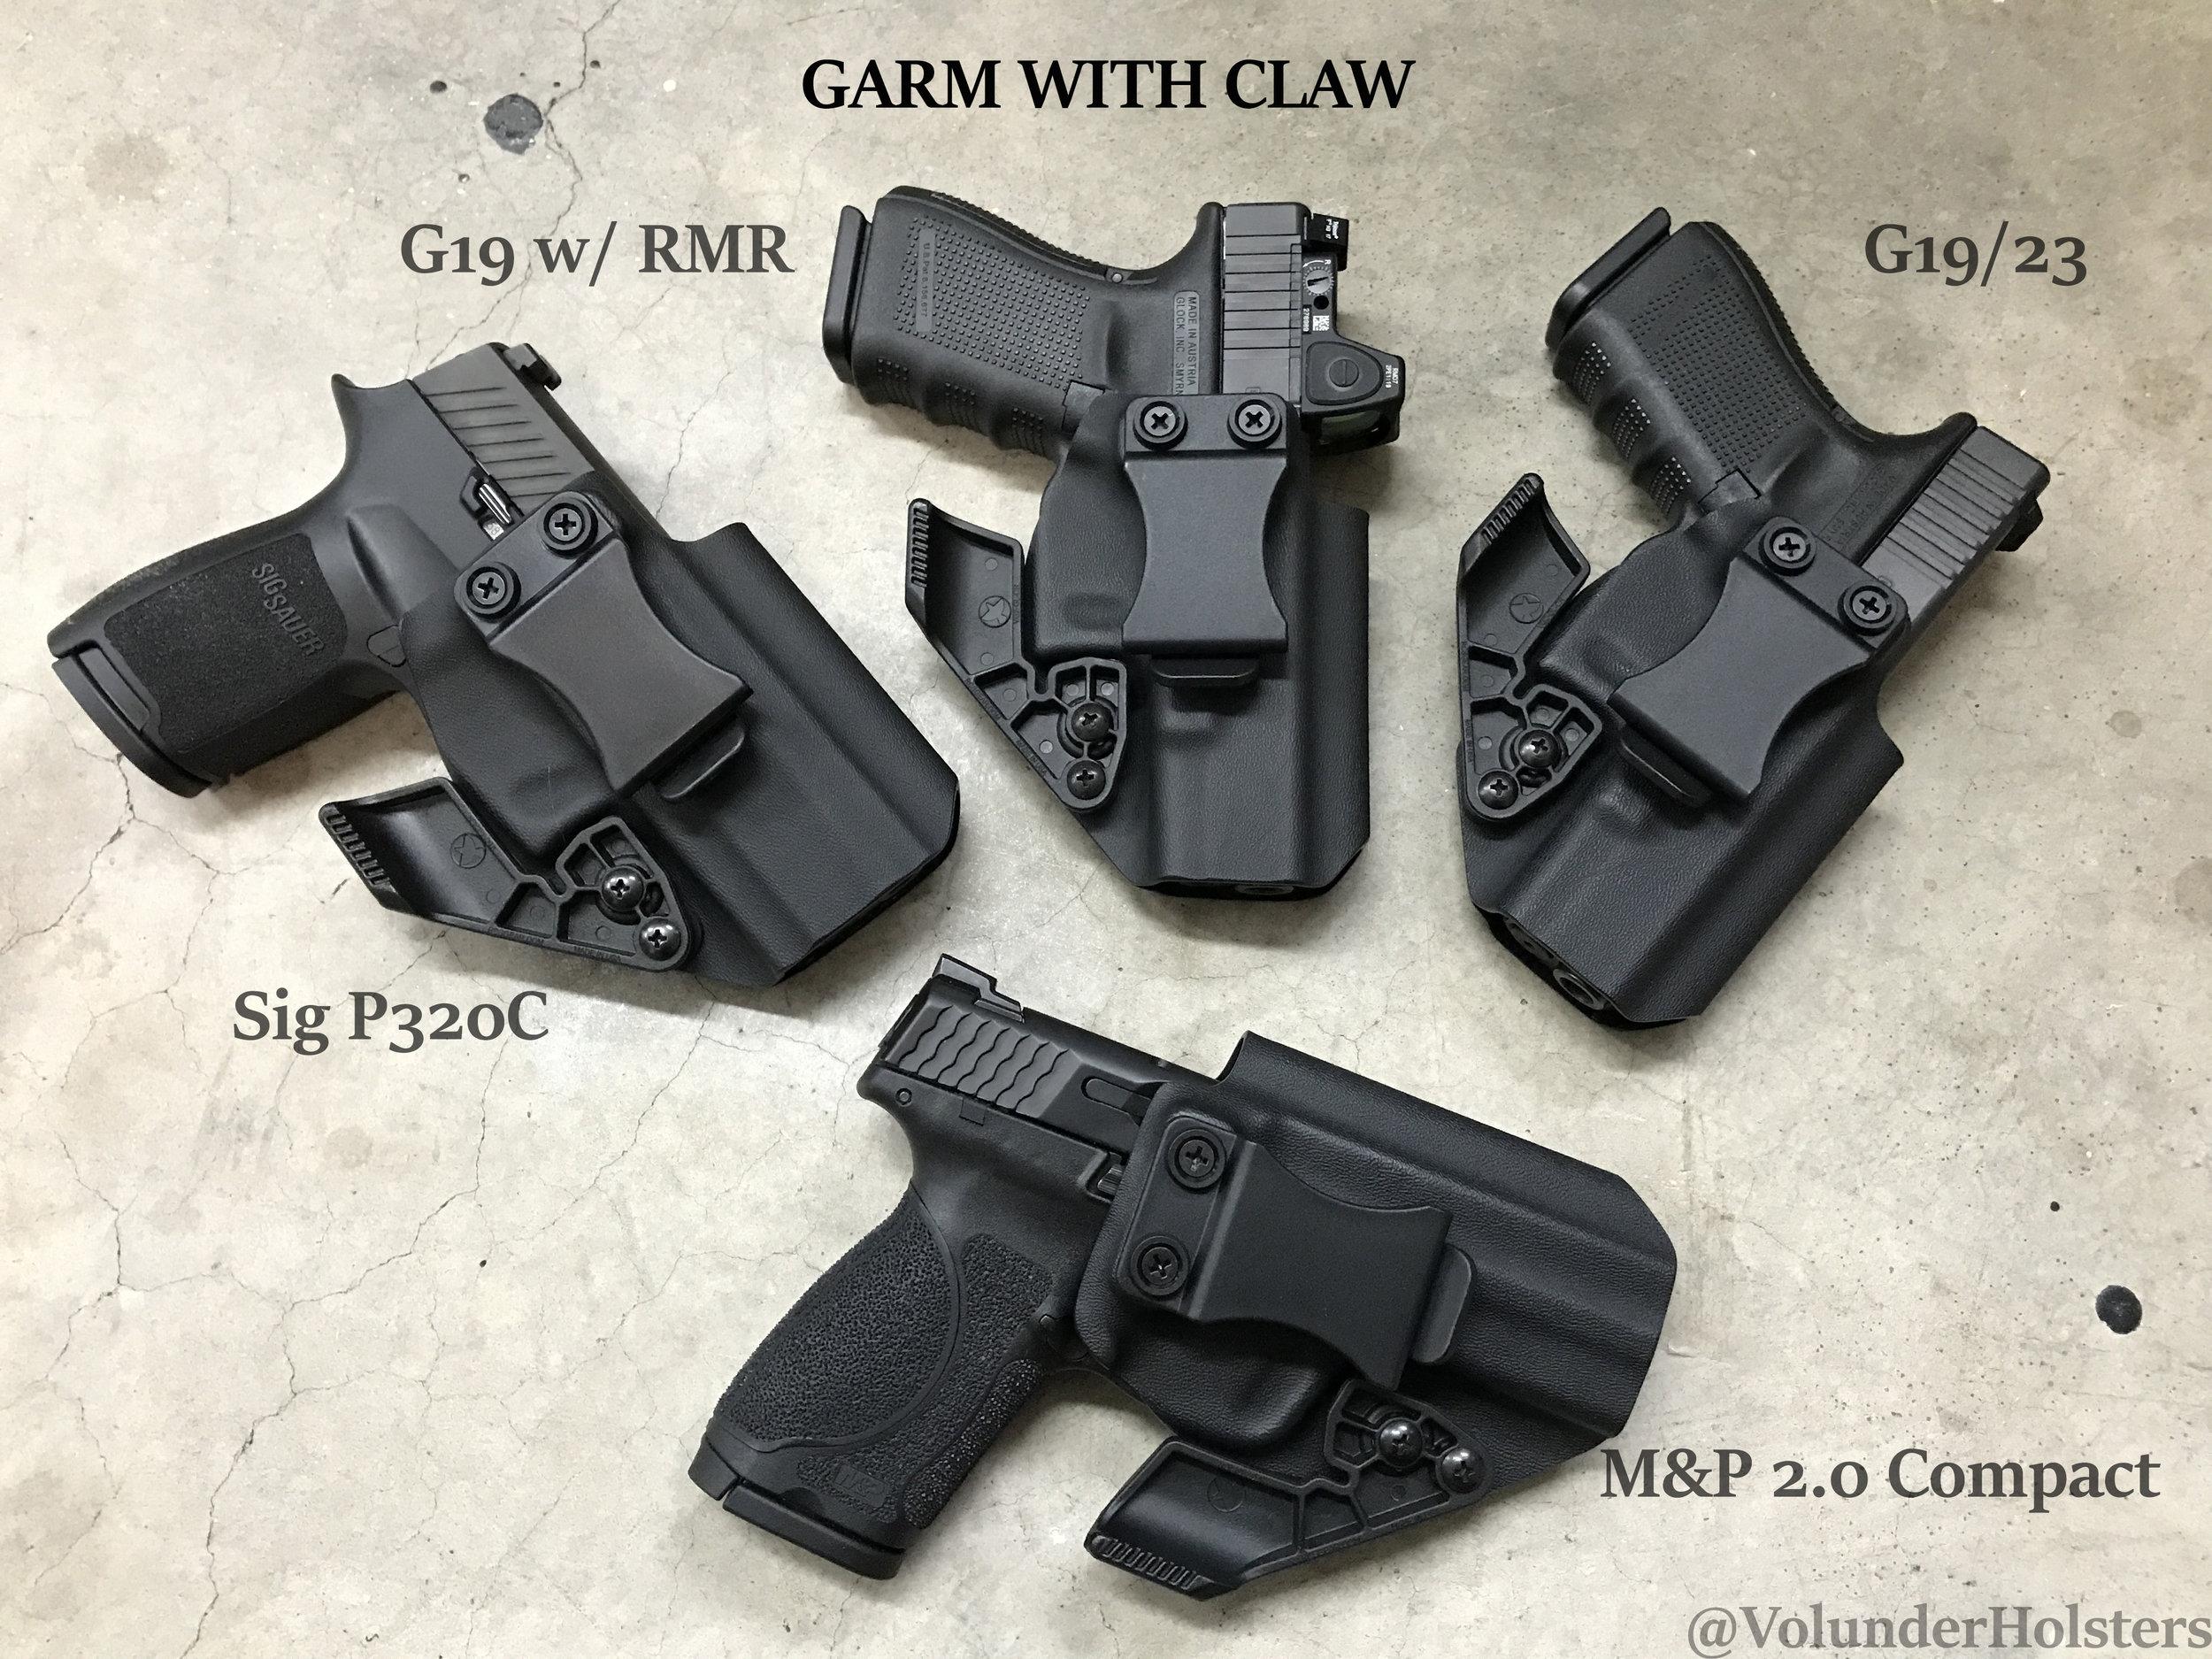 Garm with Claw Group Pics v1.jpg